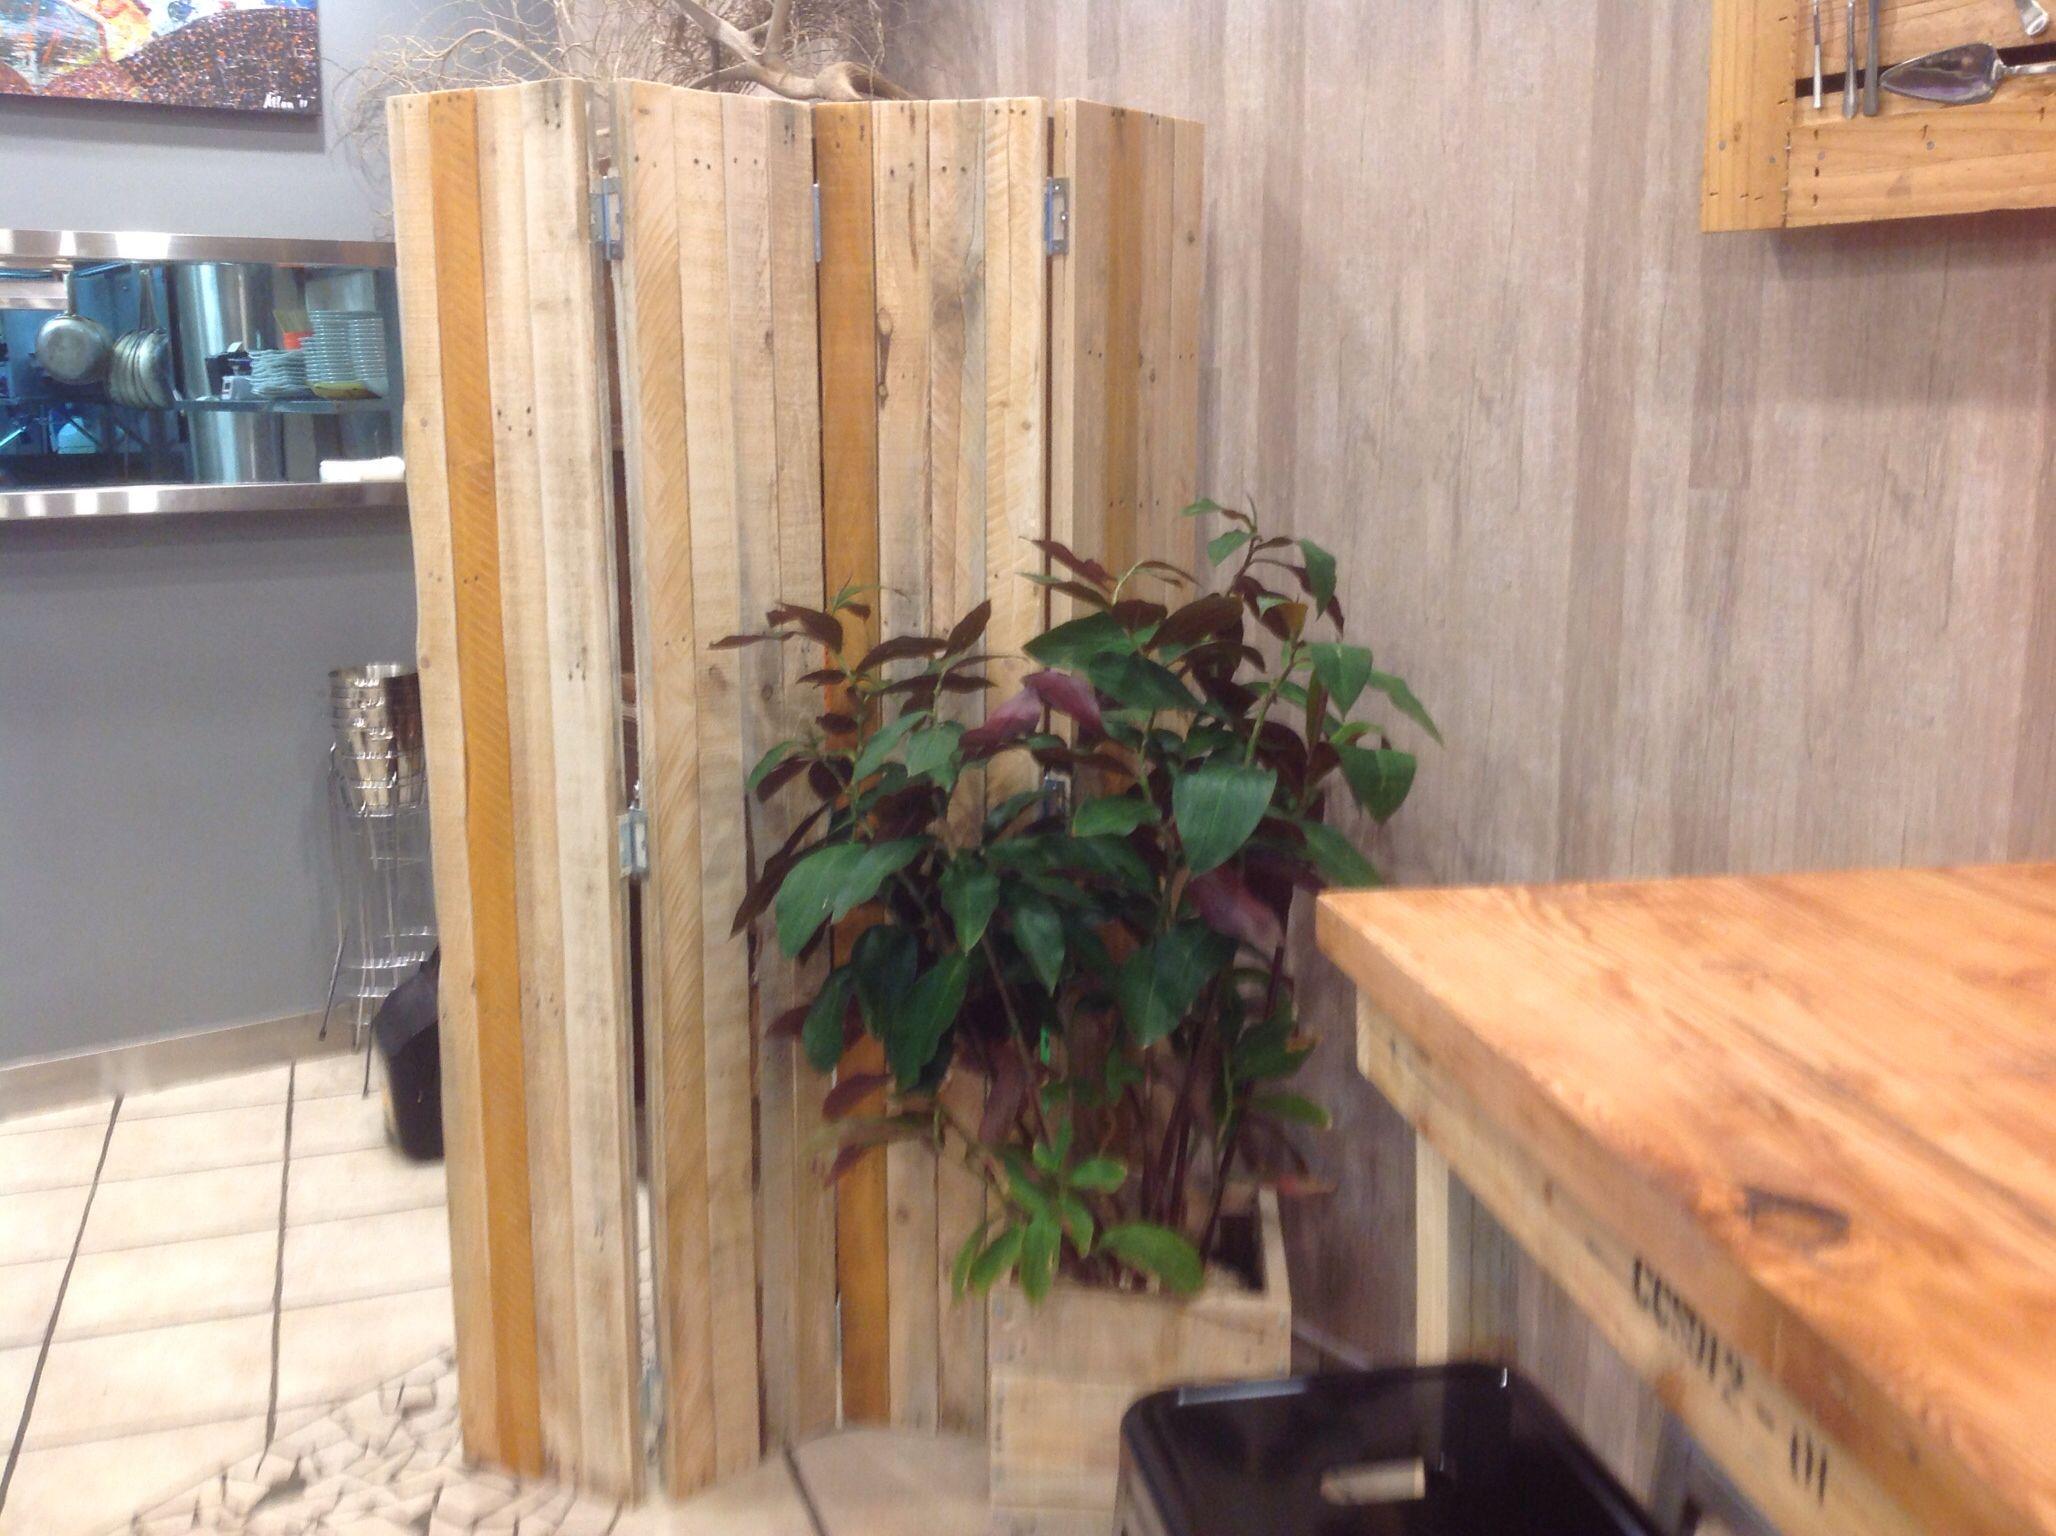 Rustic screen divider custom made for De Ja Vu Cafe Bar